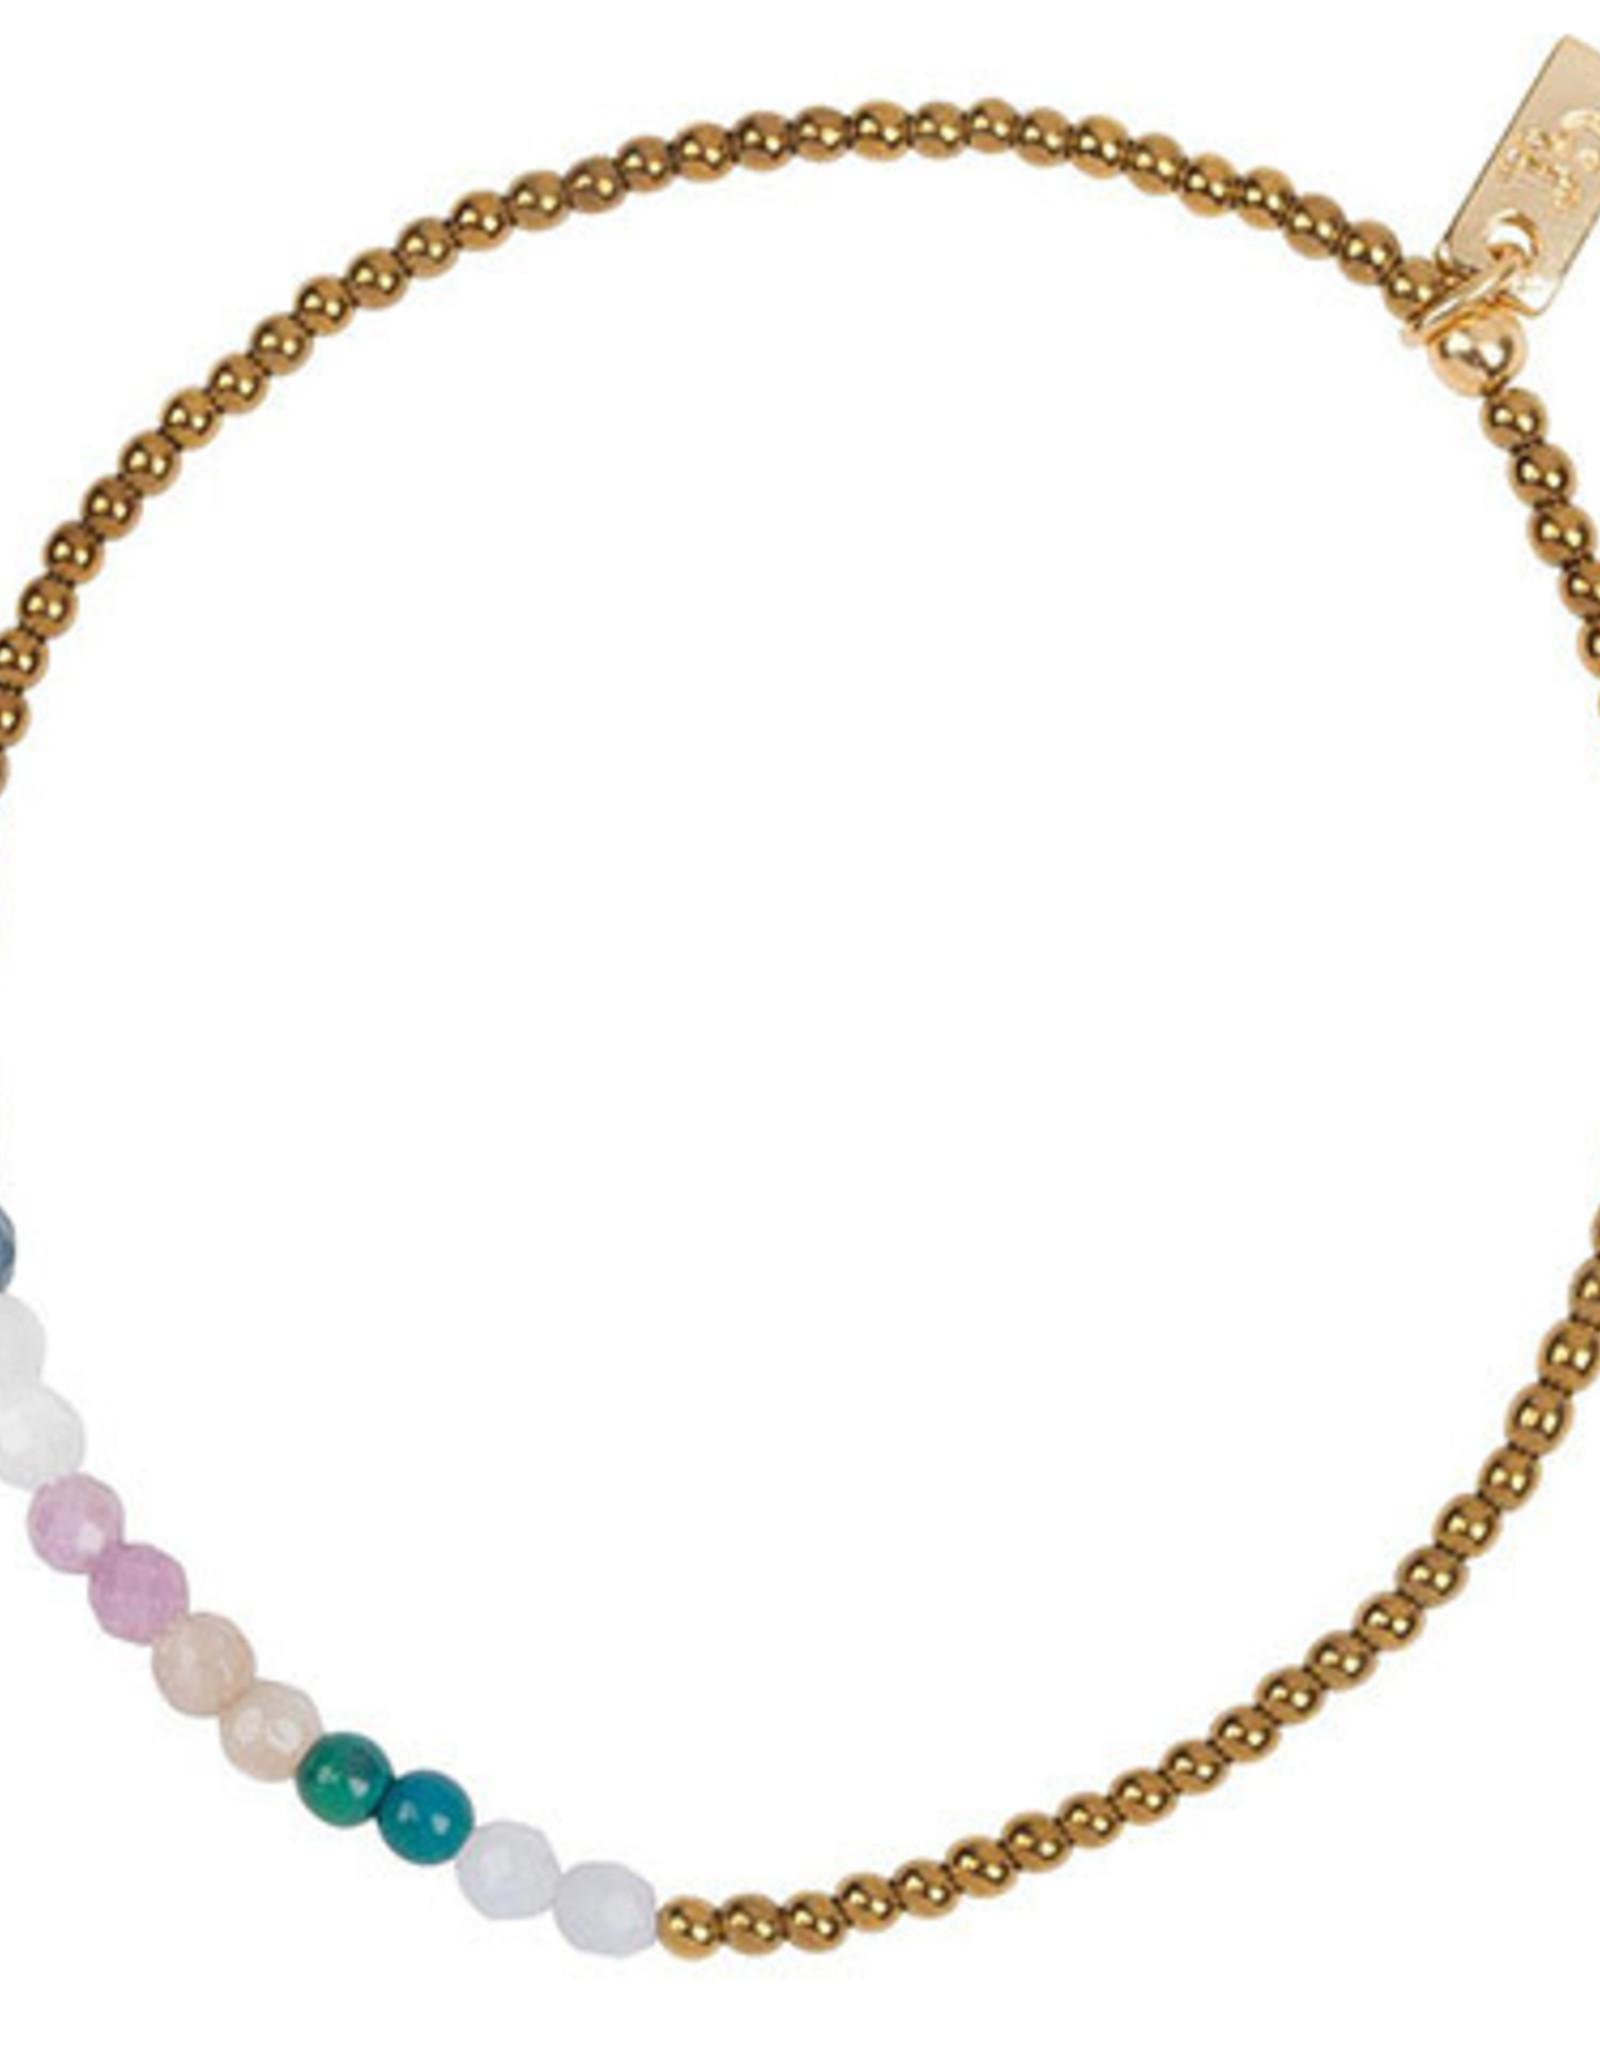 Jules Bean Armband Collectabean XL Doux-hematite/chrysocolla/chalcedon/pearl/sunstone/phosphosiderite